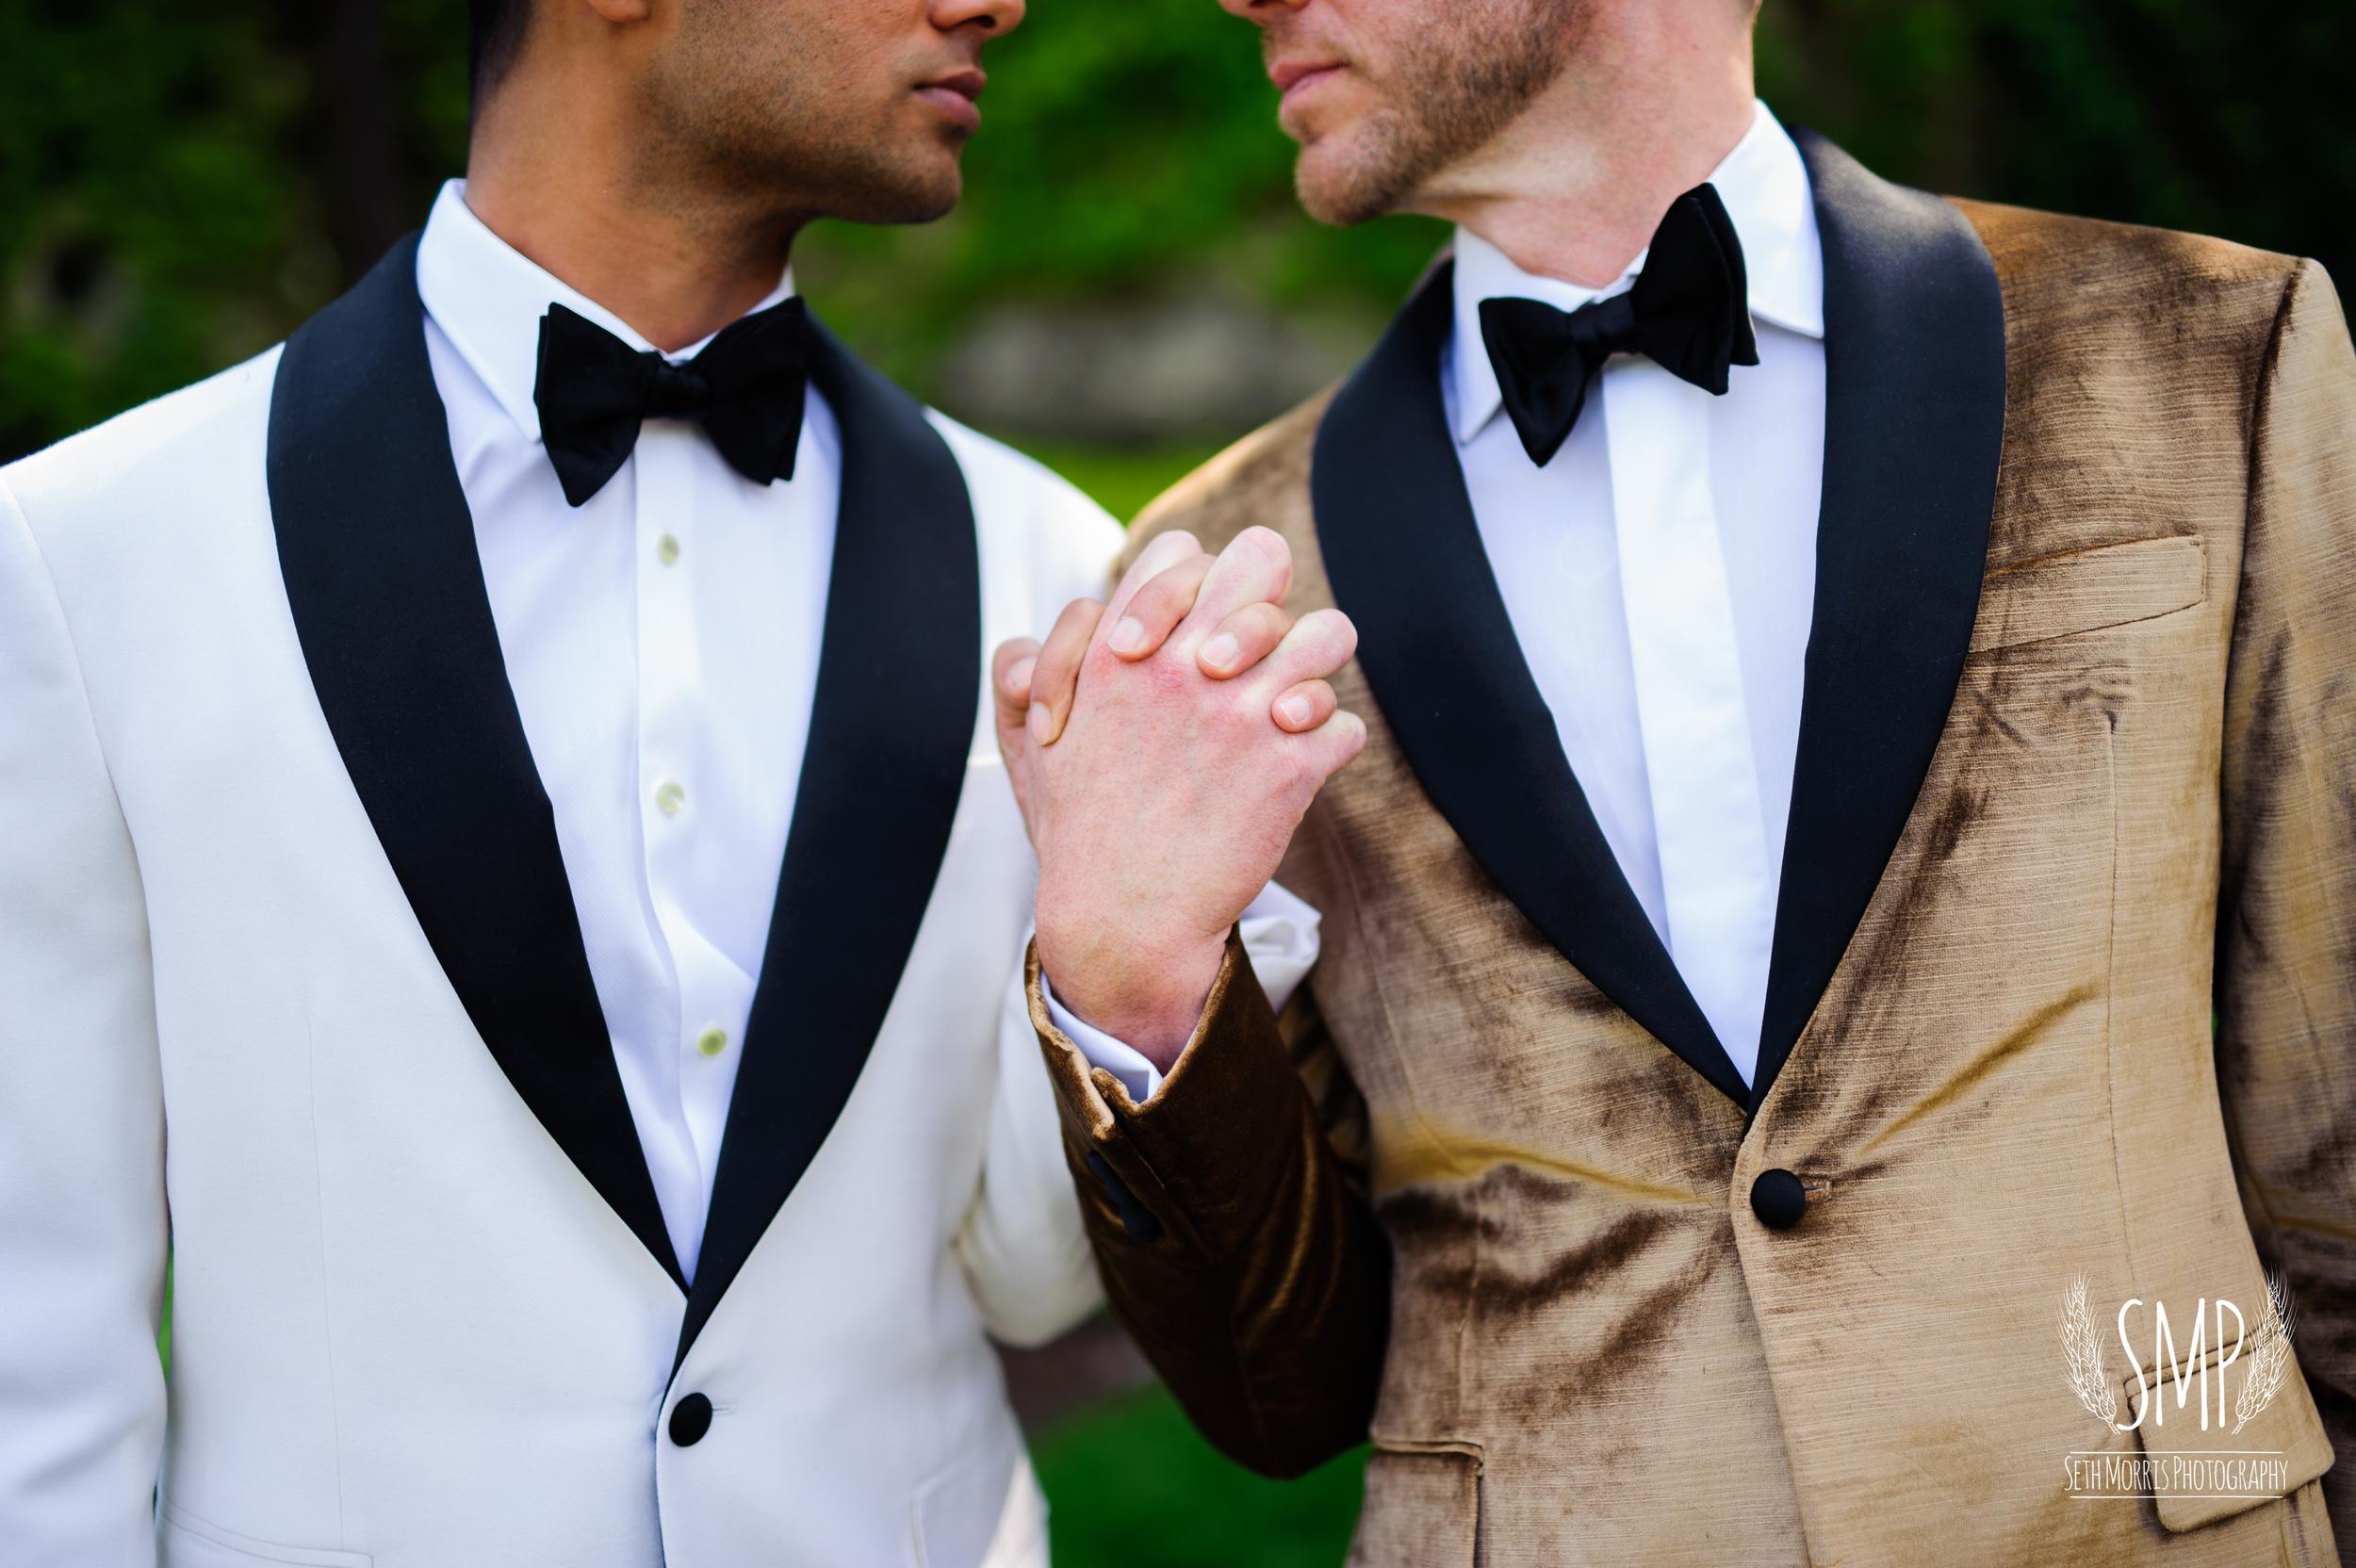 same-sex-wedding-photographer-chicago-illinois-18.jpg